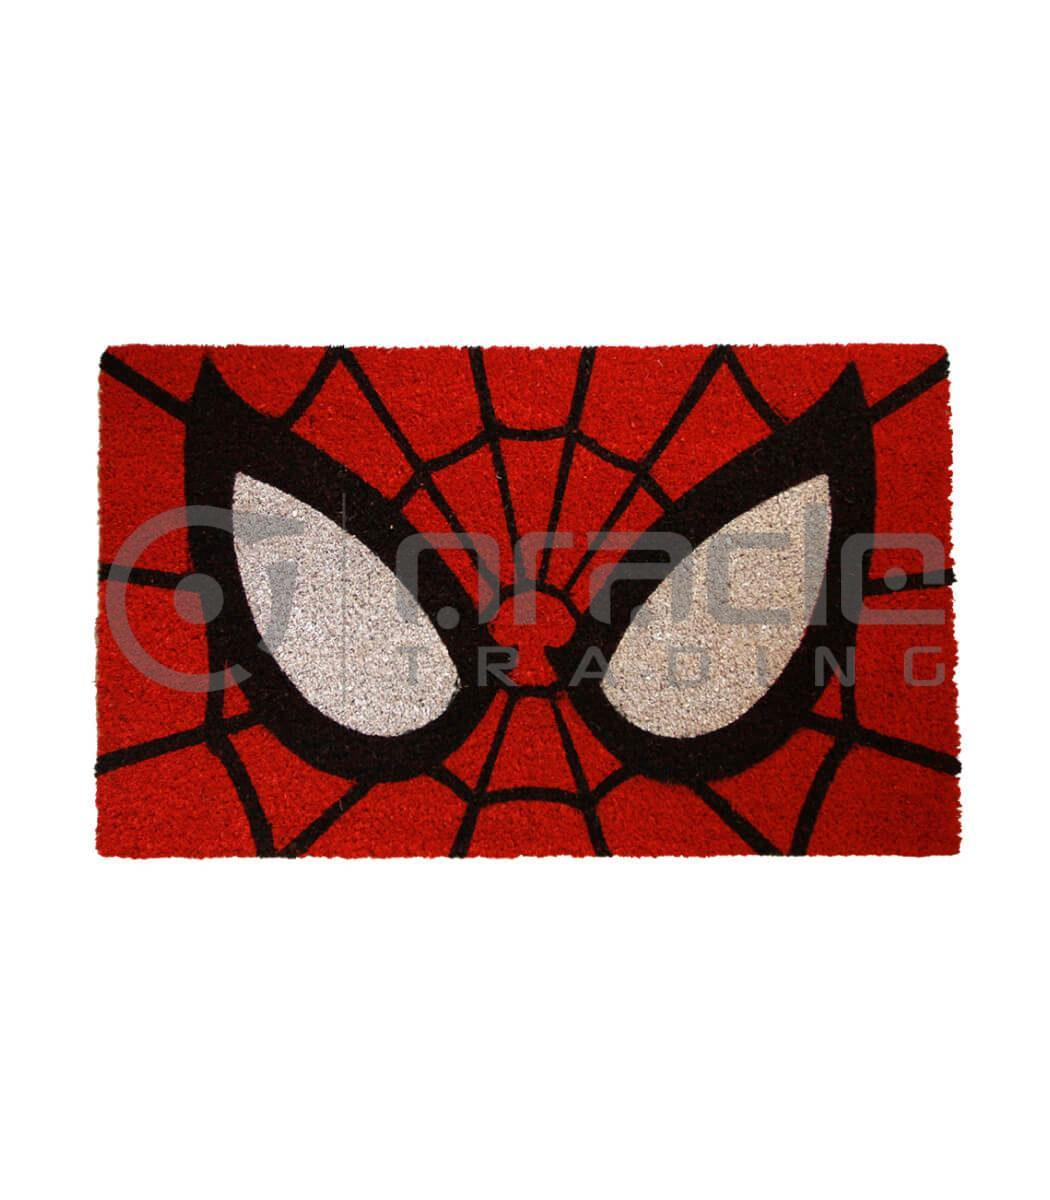 Spiderman Doormat - Eyes